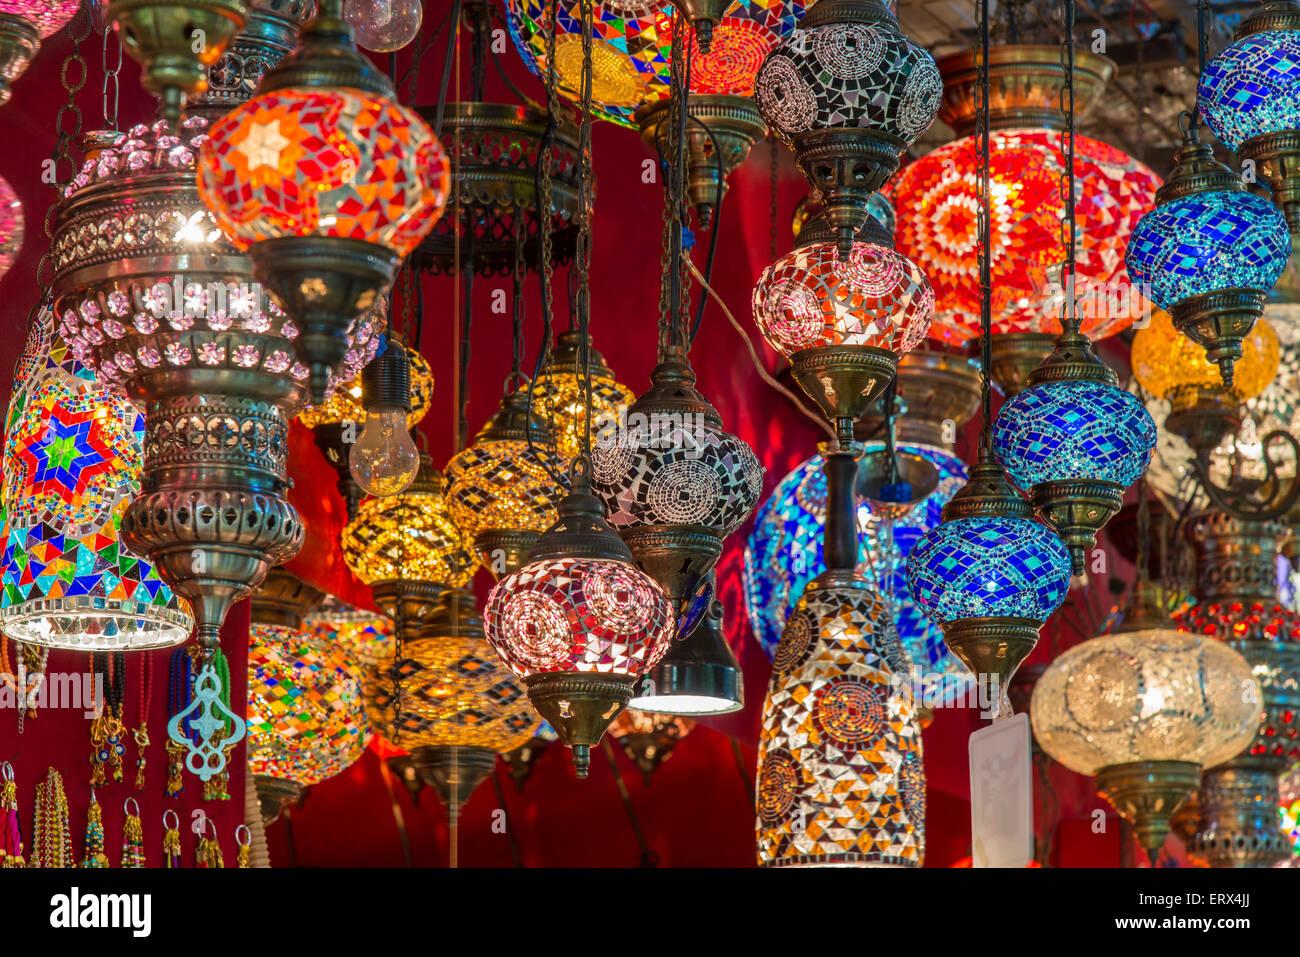 Lanterns hanging in a shop inside the Grand Bazaar (Kapalıcarsi), Istanbul, Turkey - Stock Image